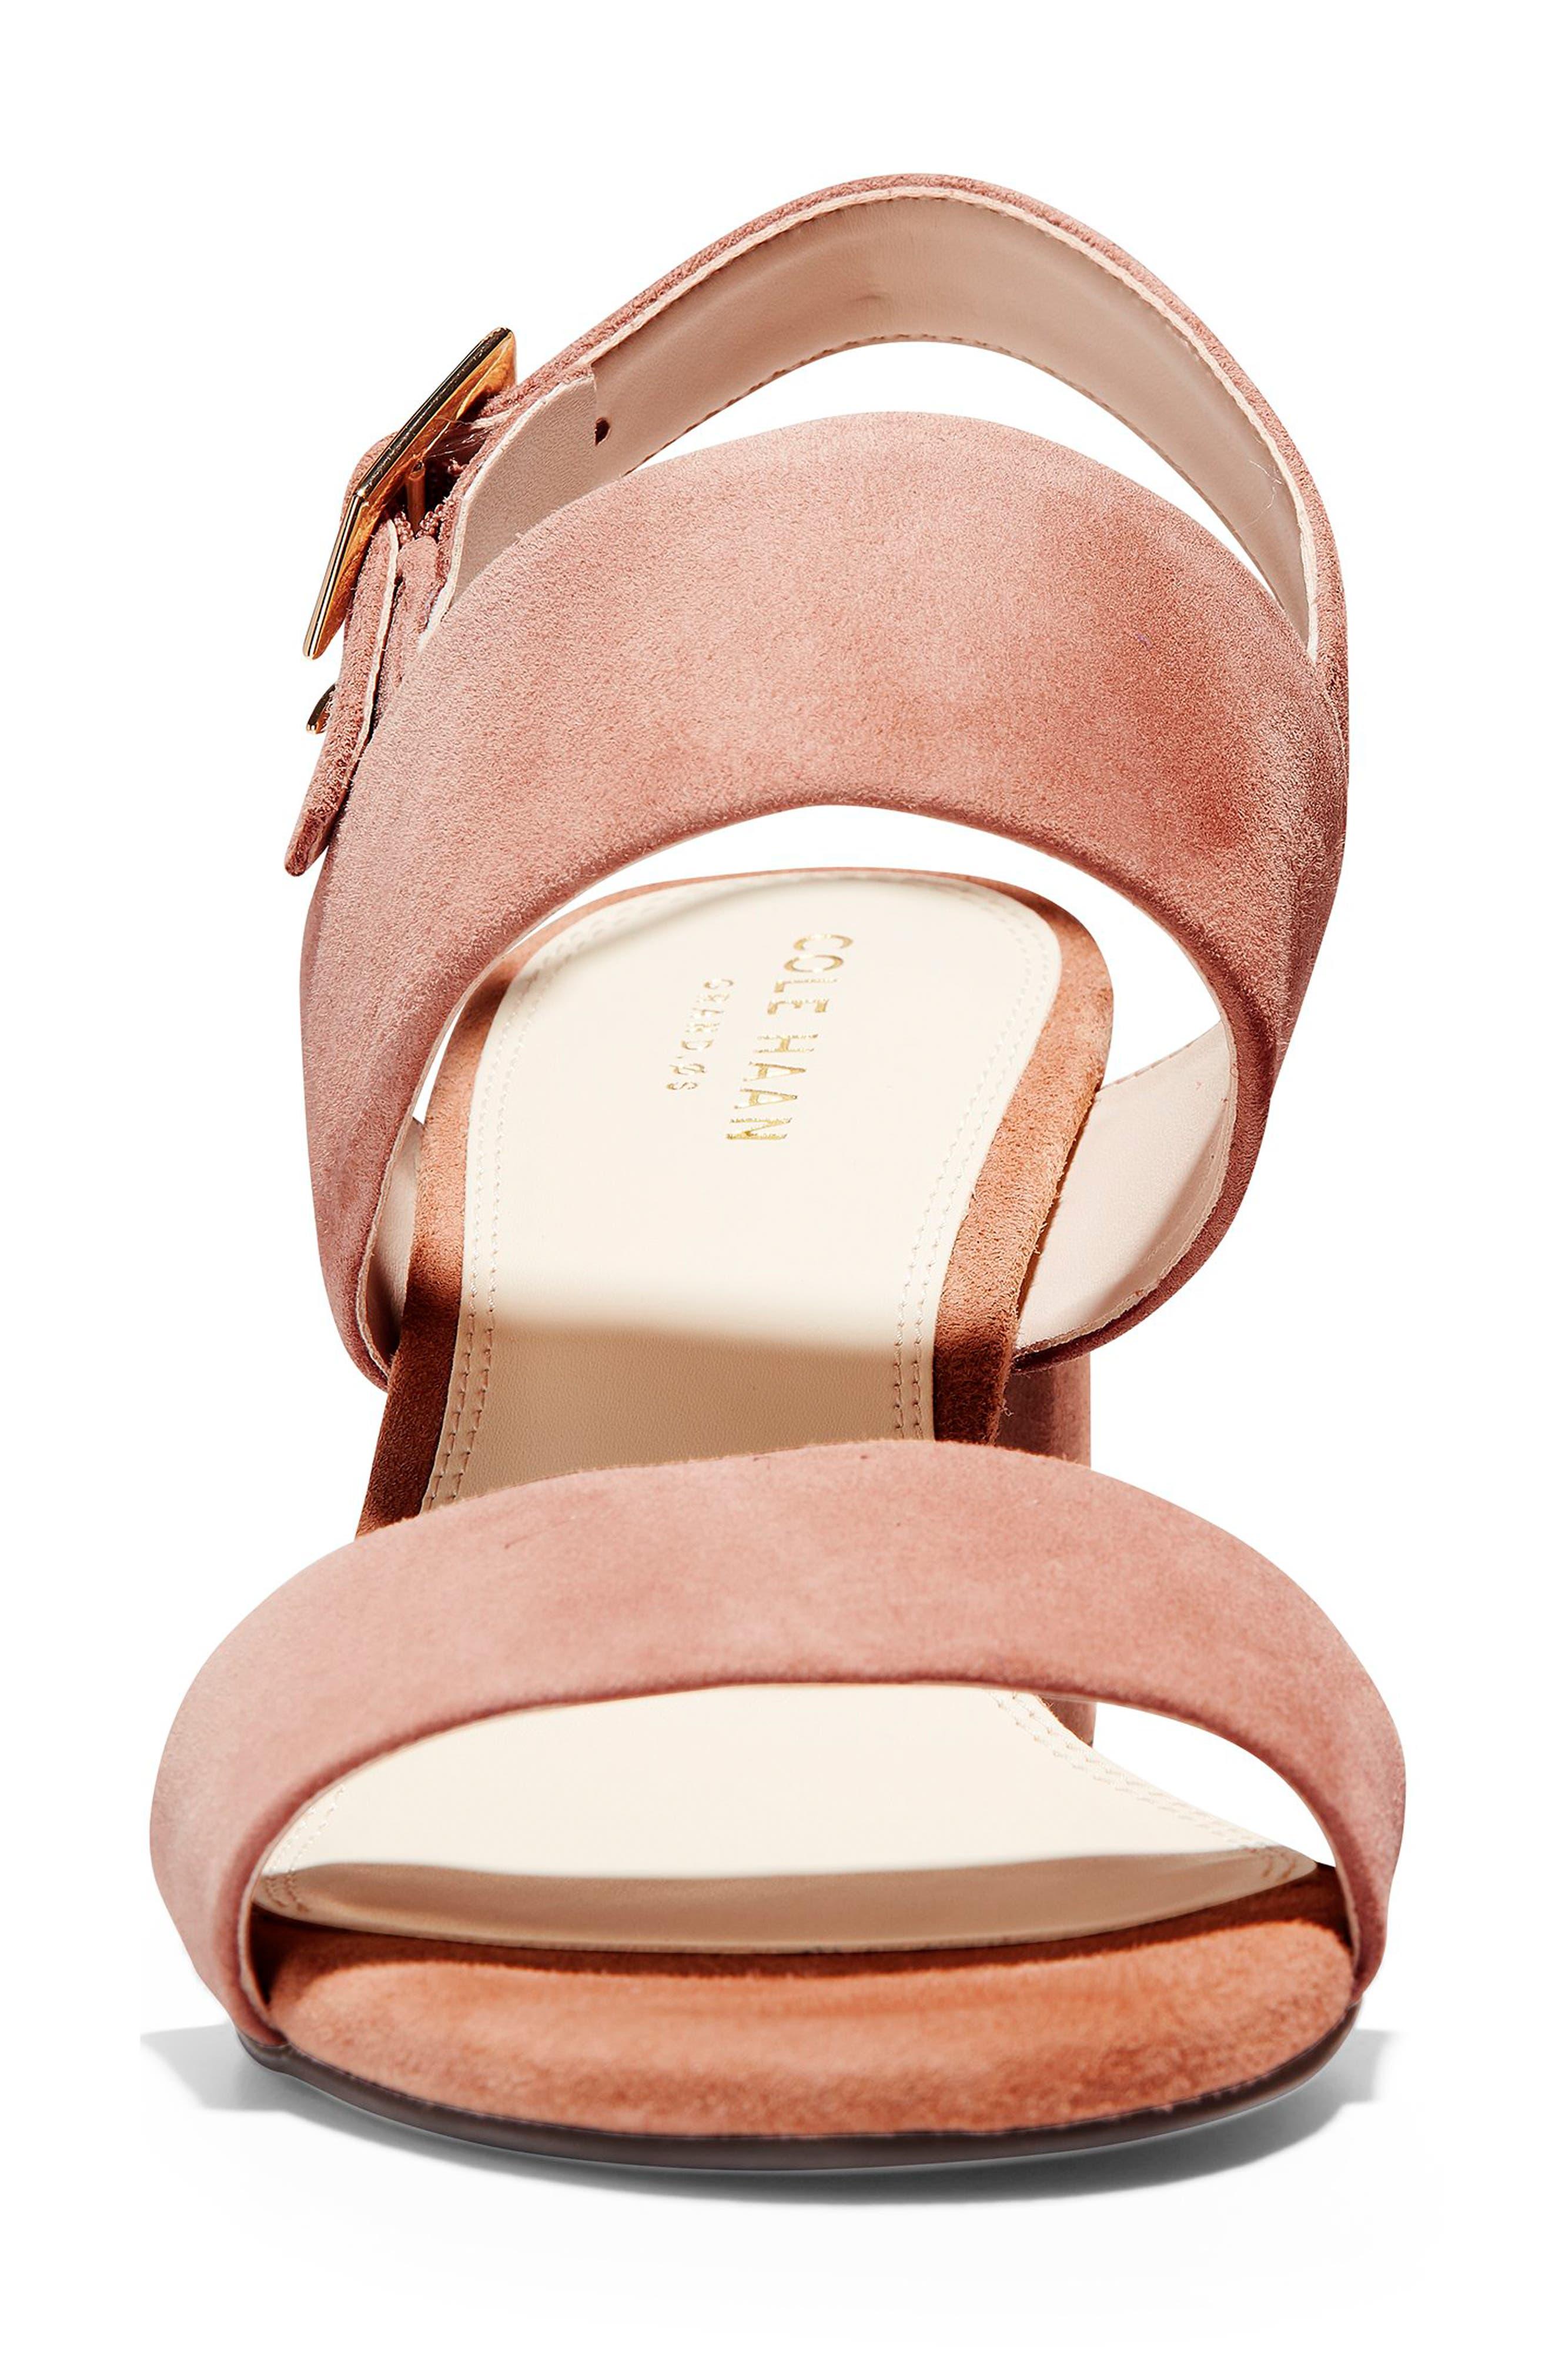 Avani Block Heel Sandal,                             Alternate thumbnail 4, color,                             MOCHA MOUSSE SUEDE